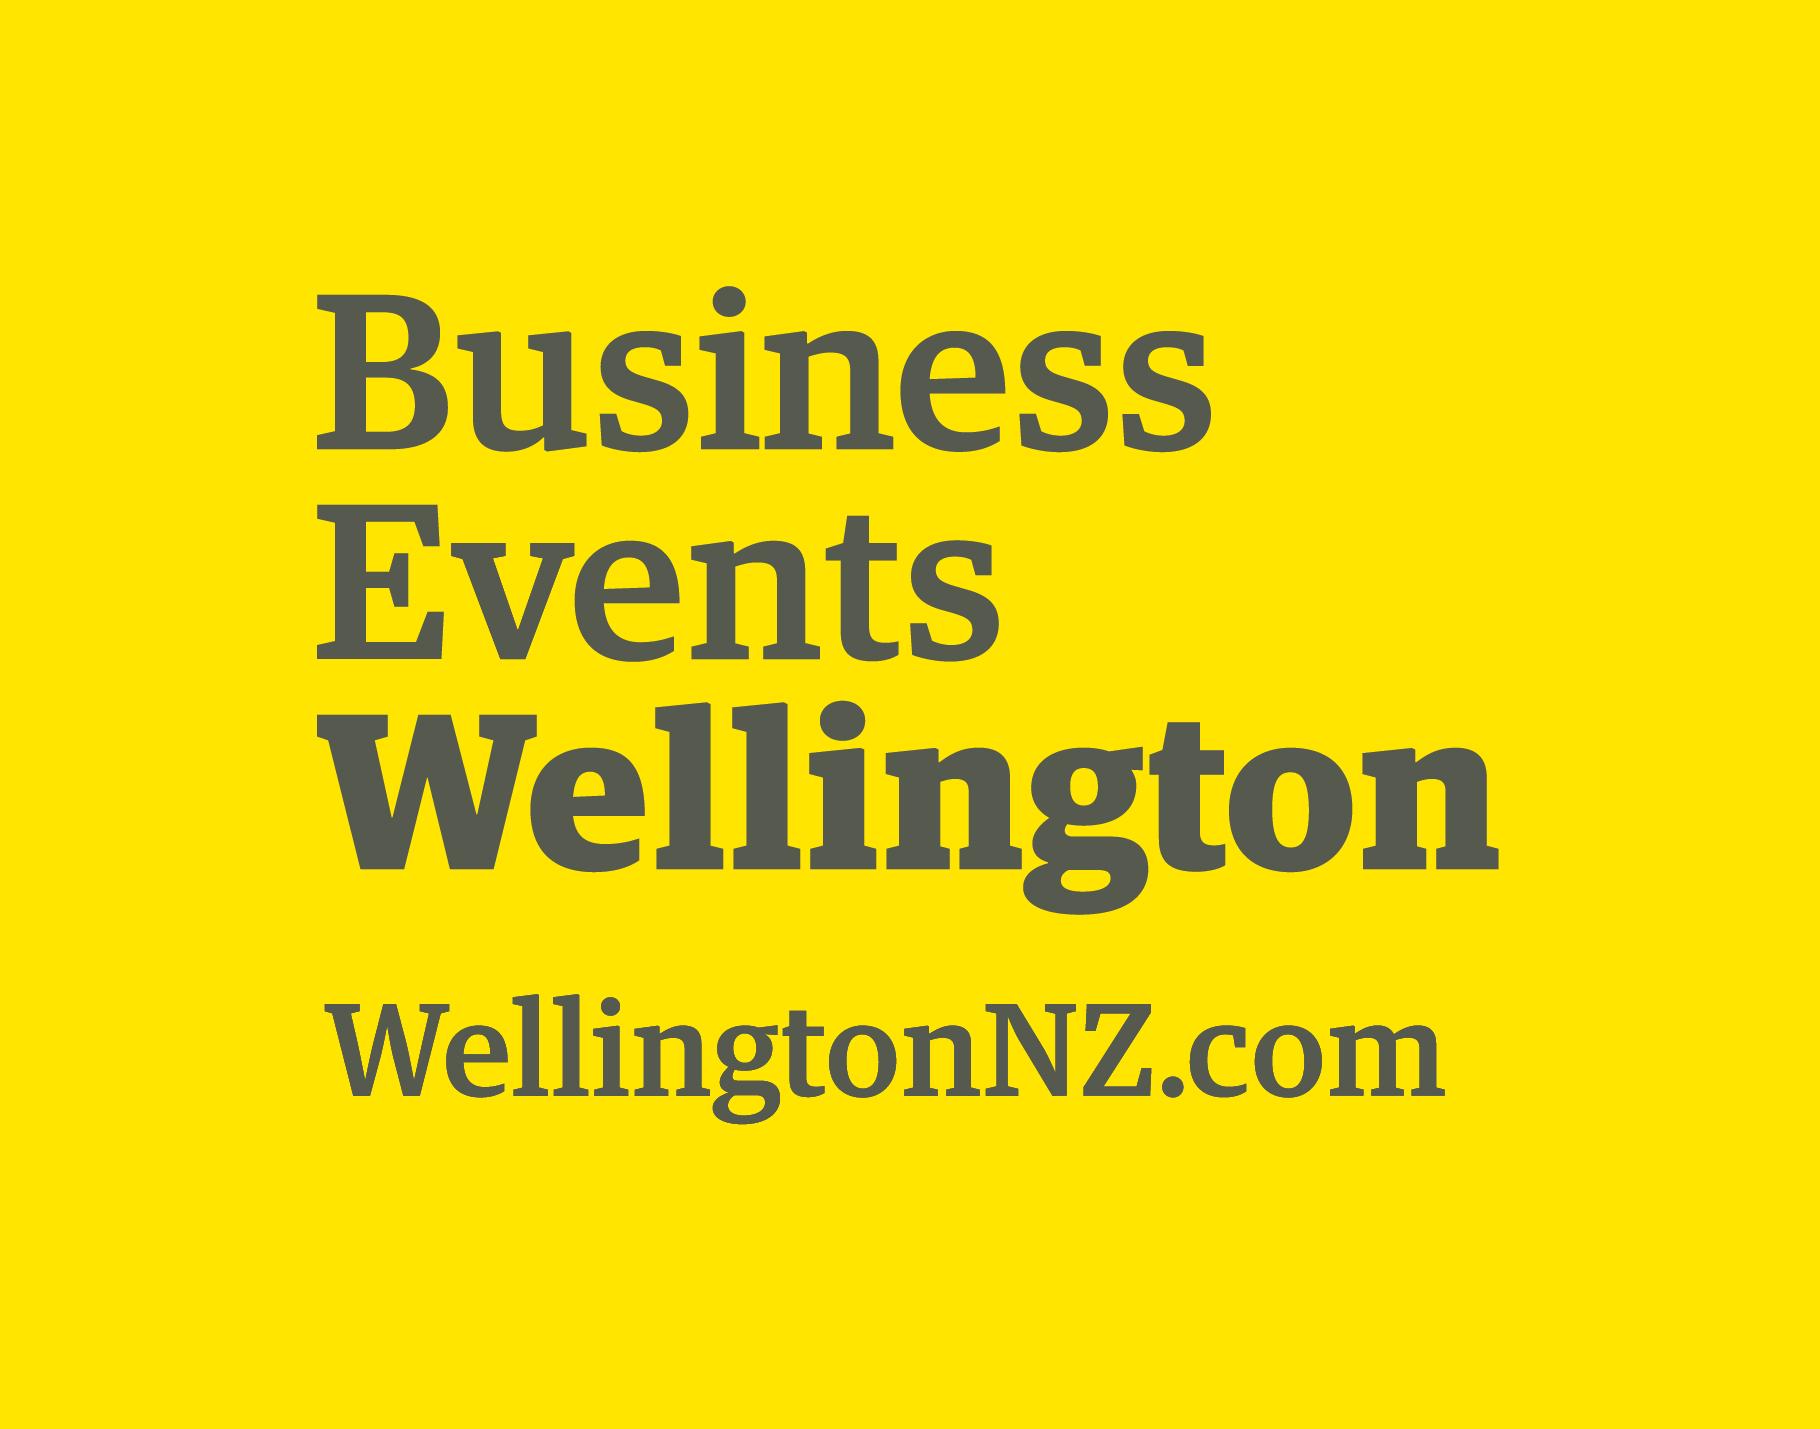 Business Events Wellington